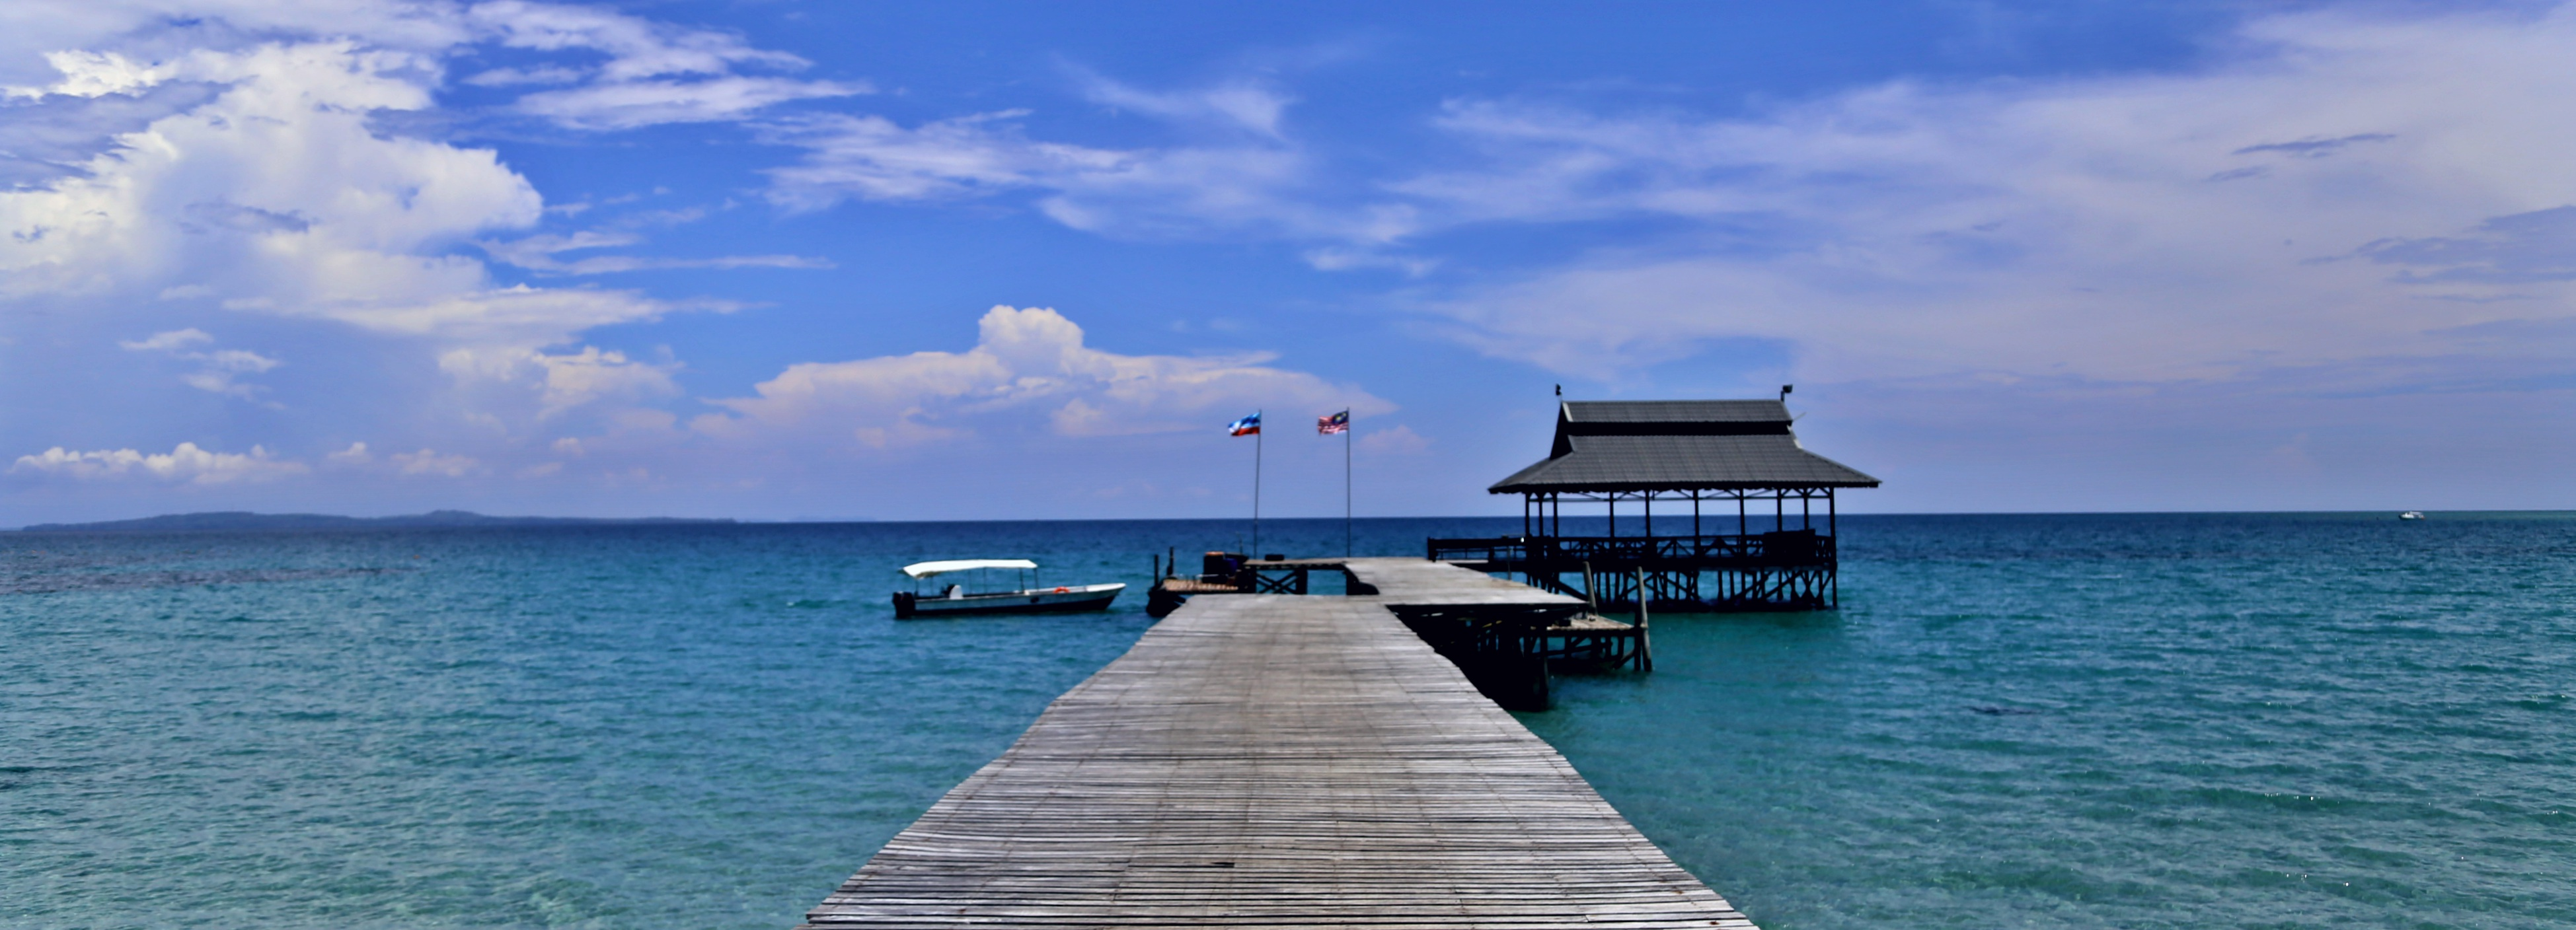 Sabah 2-Day Tour : Tiga Island Resort, Volcanic Mud Bath, Snake Island, Pehu Island